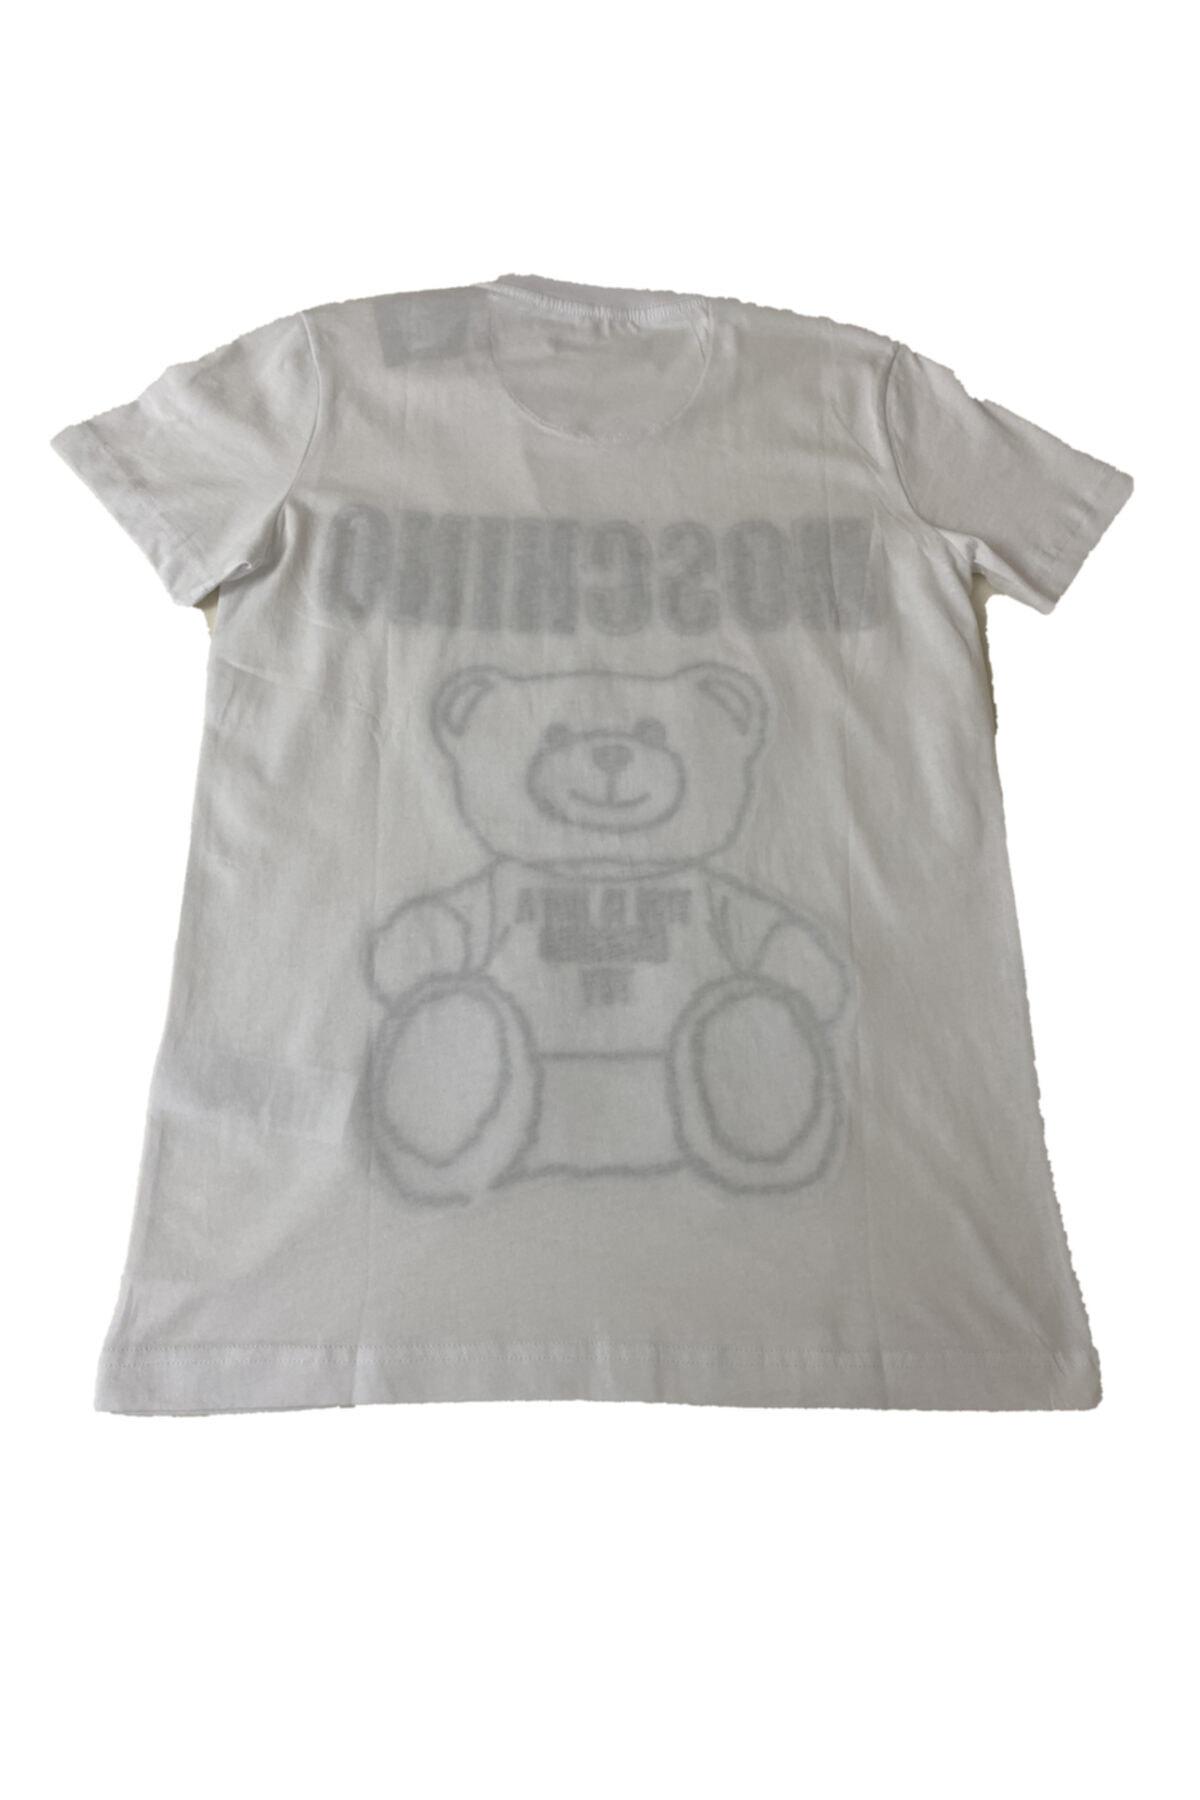 Moschino Ayıcıklı Unisex Tshirt 2